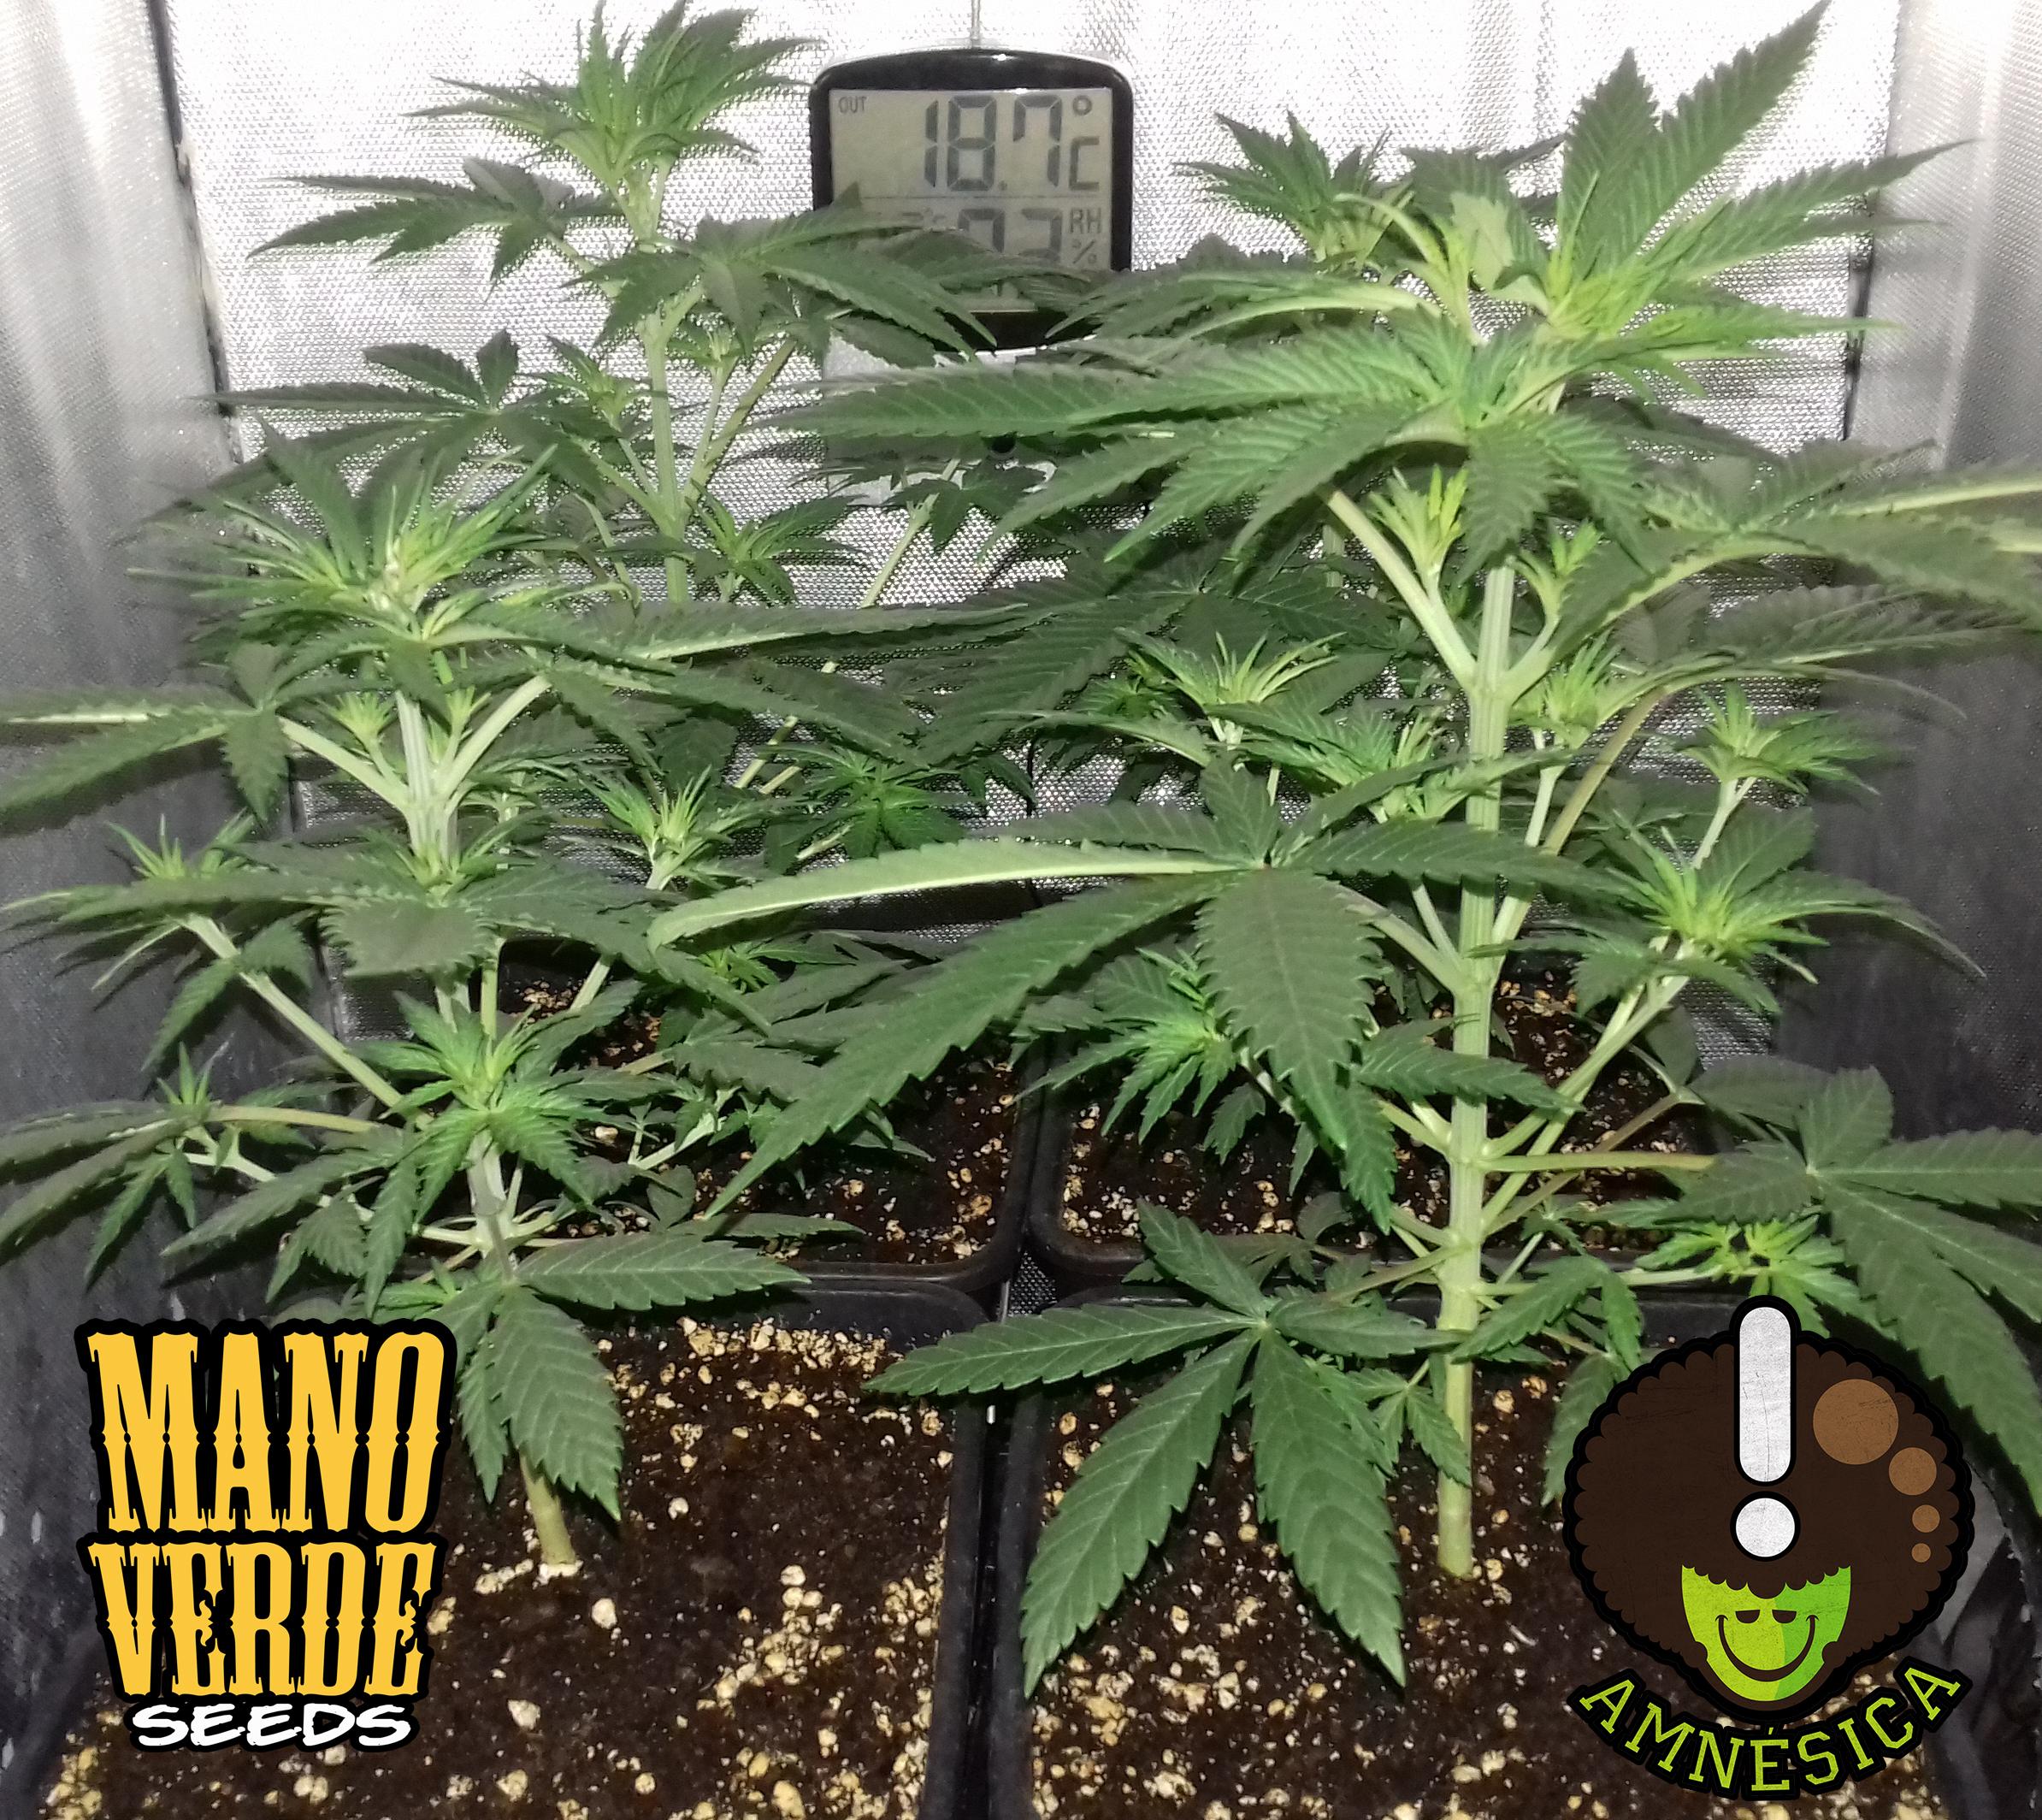 amnesica-manoverde-seeds-23c-14f-230